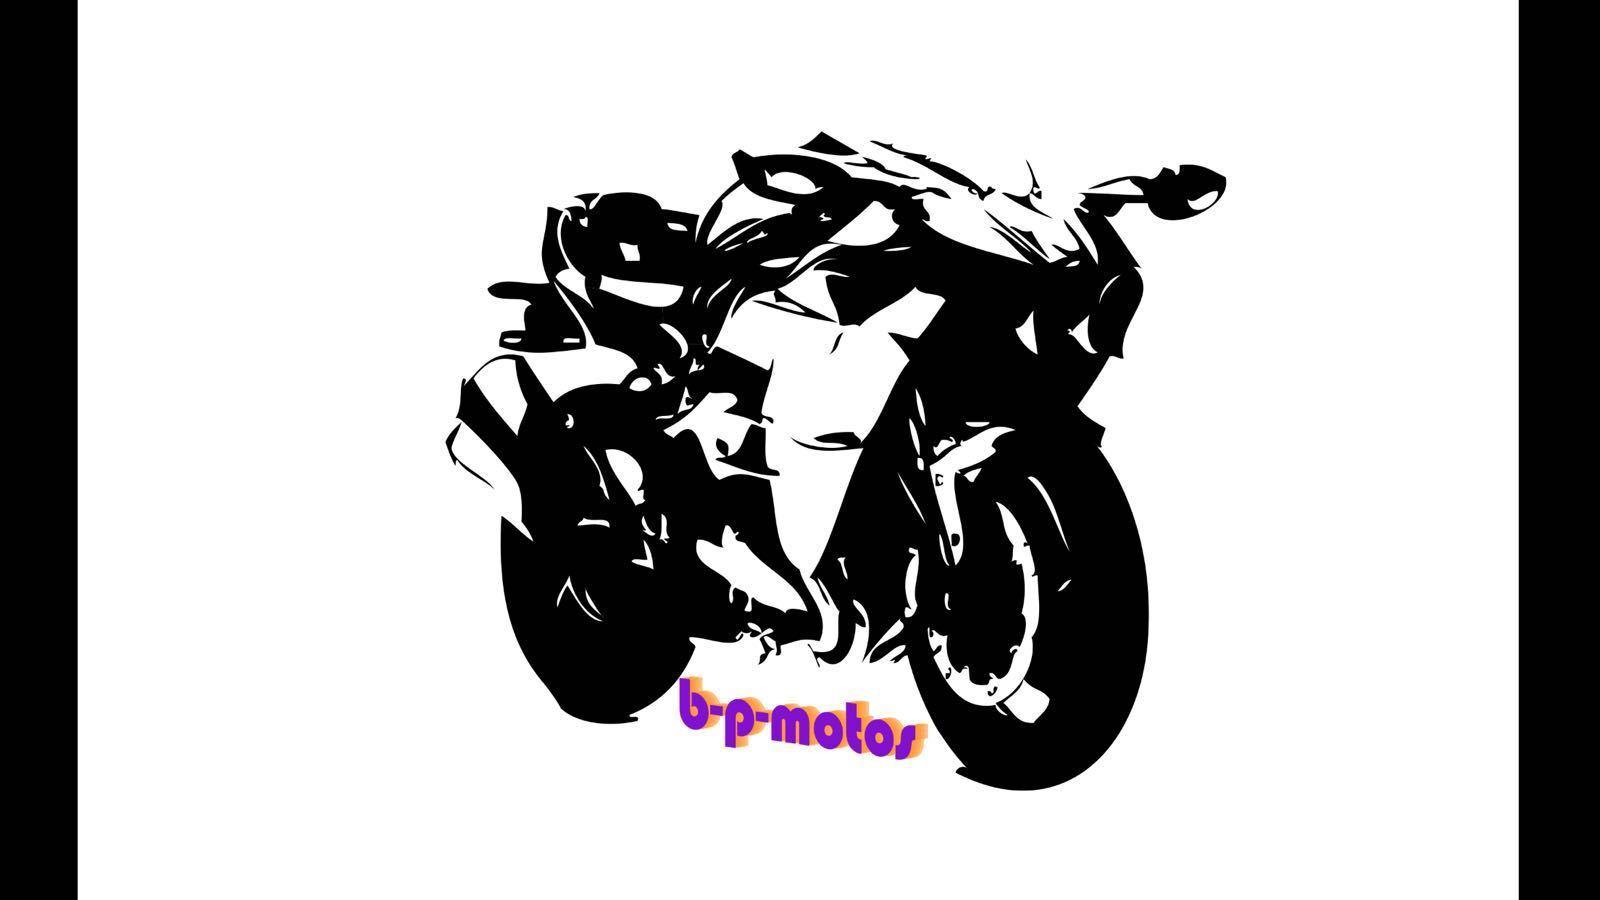 b-p-motos